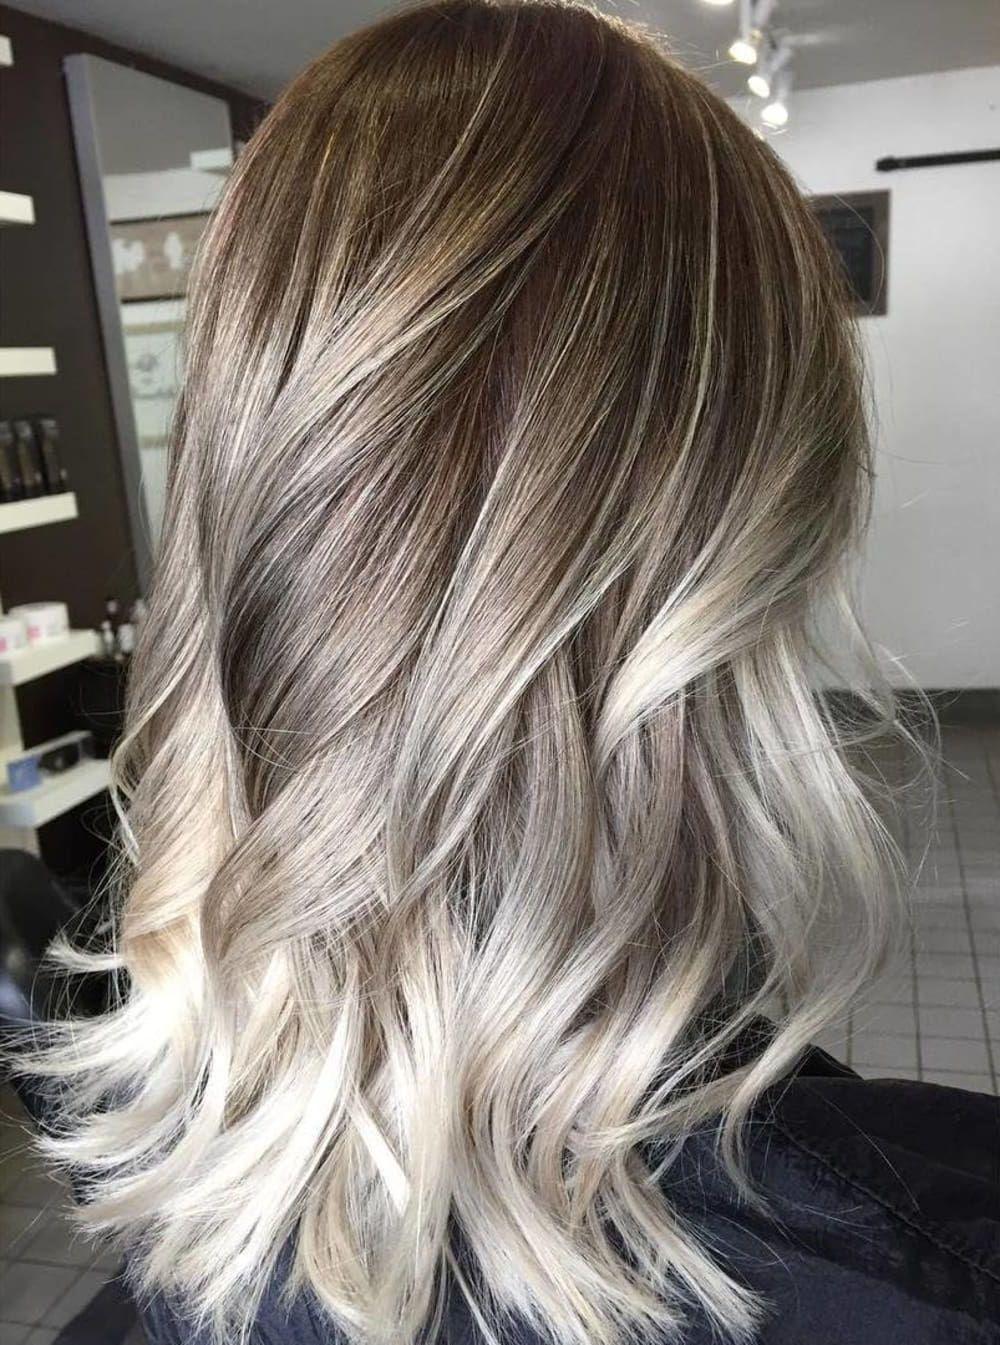 70 Flattering Balayage Hair Color Ideas For 2020 Balayage Hair